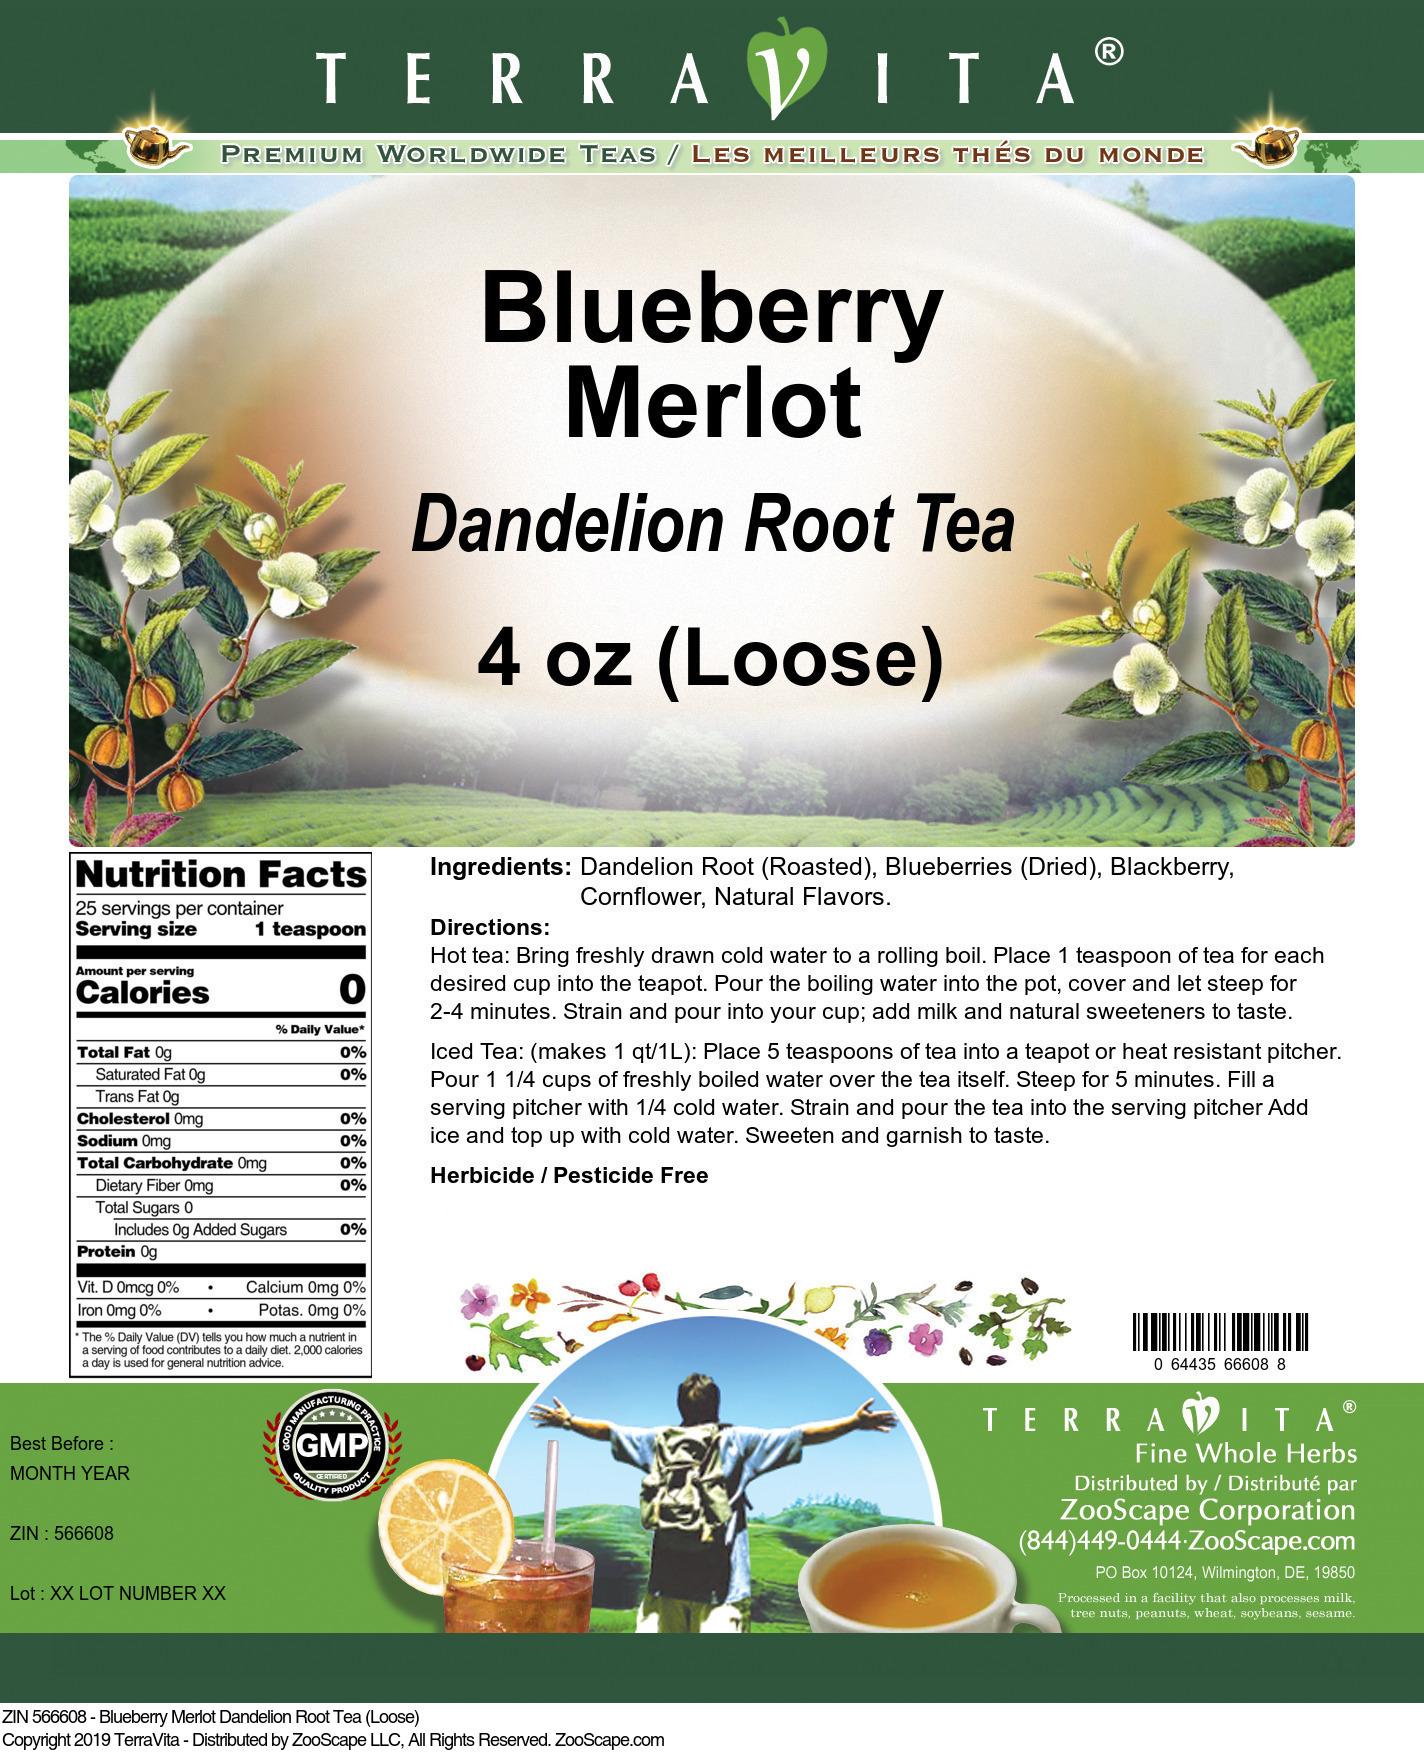 Blueberry Merlot Dandelion Root Tea (Loose)